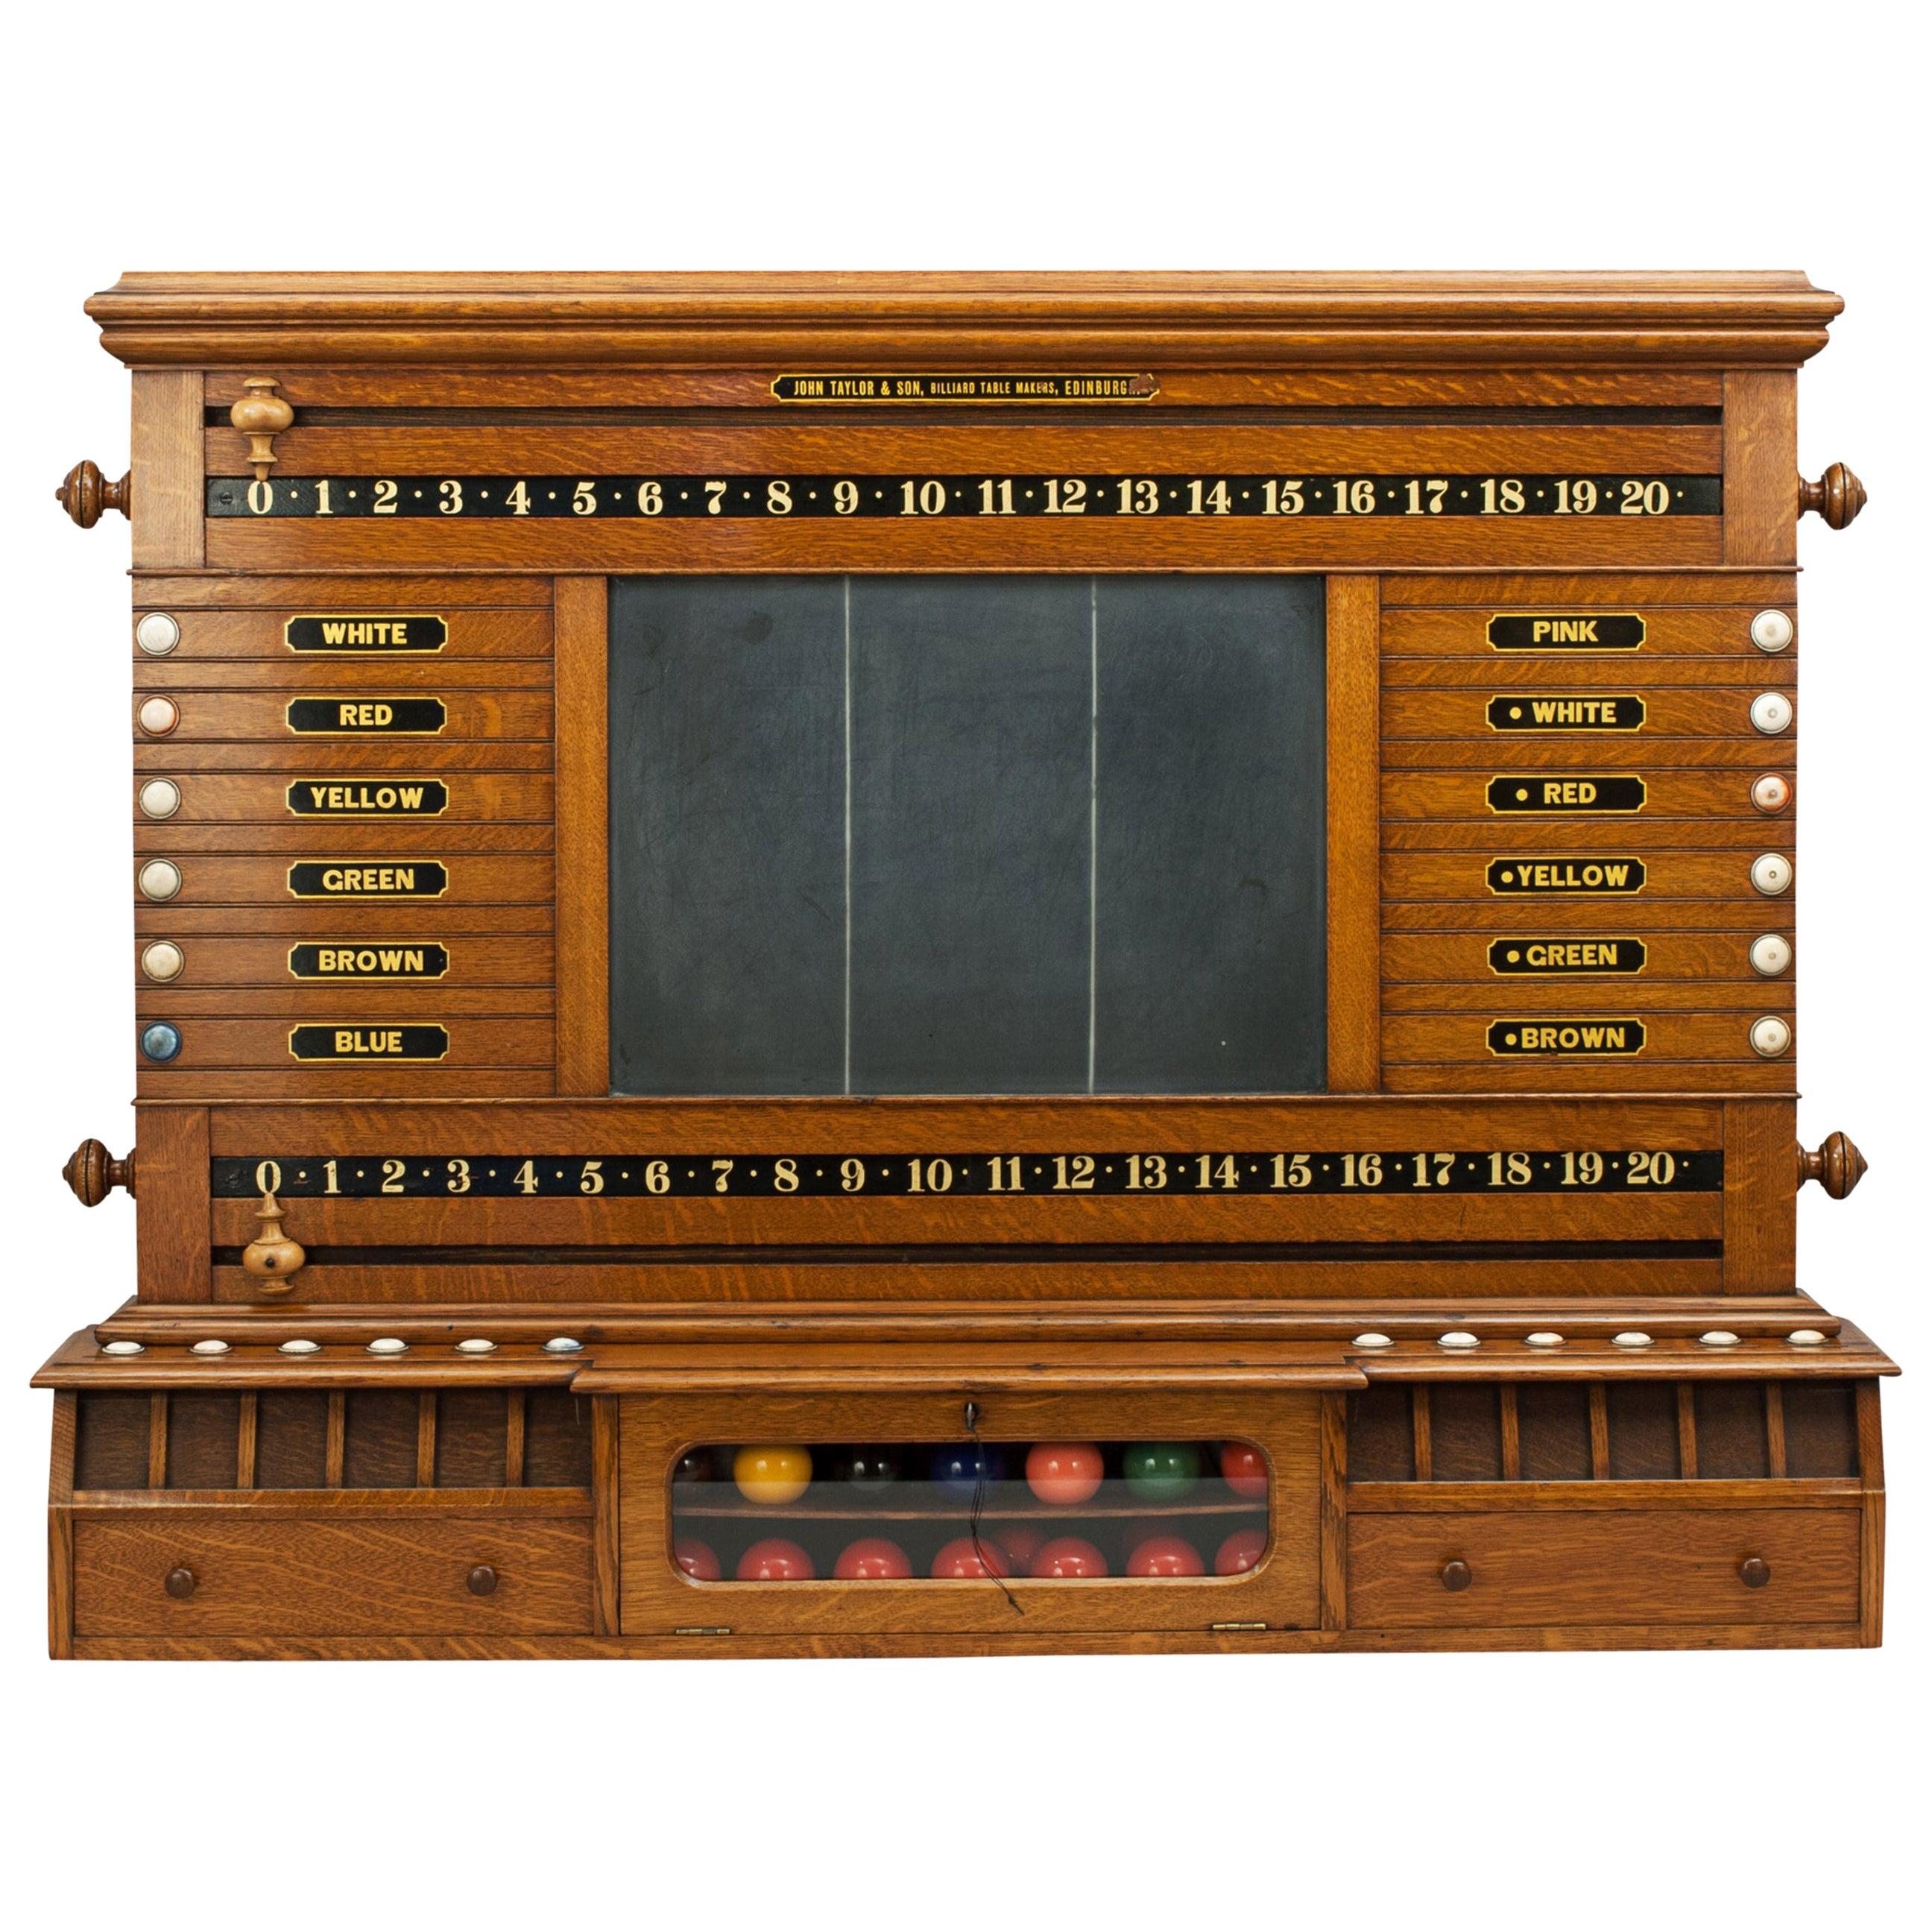 Antique John Taylor & Son Billiard, Snooker and Life Pool Score Board